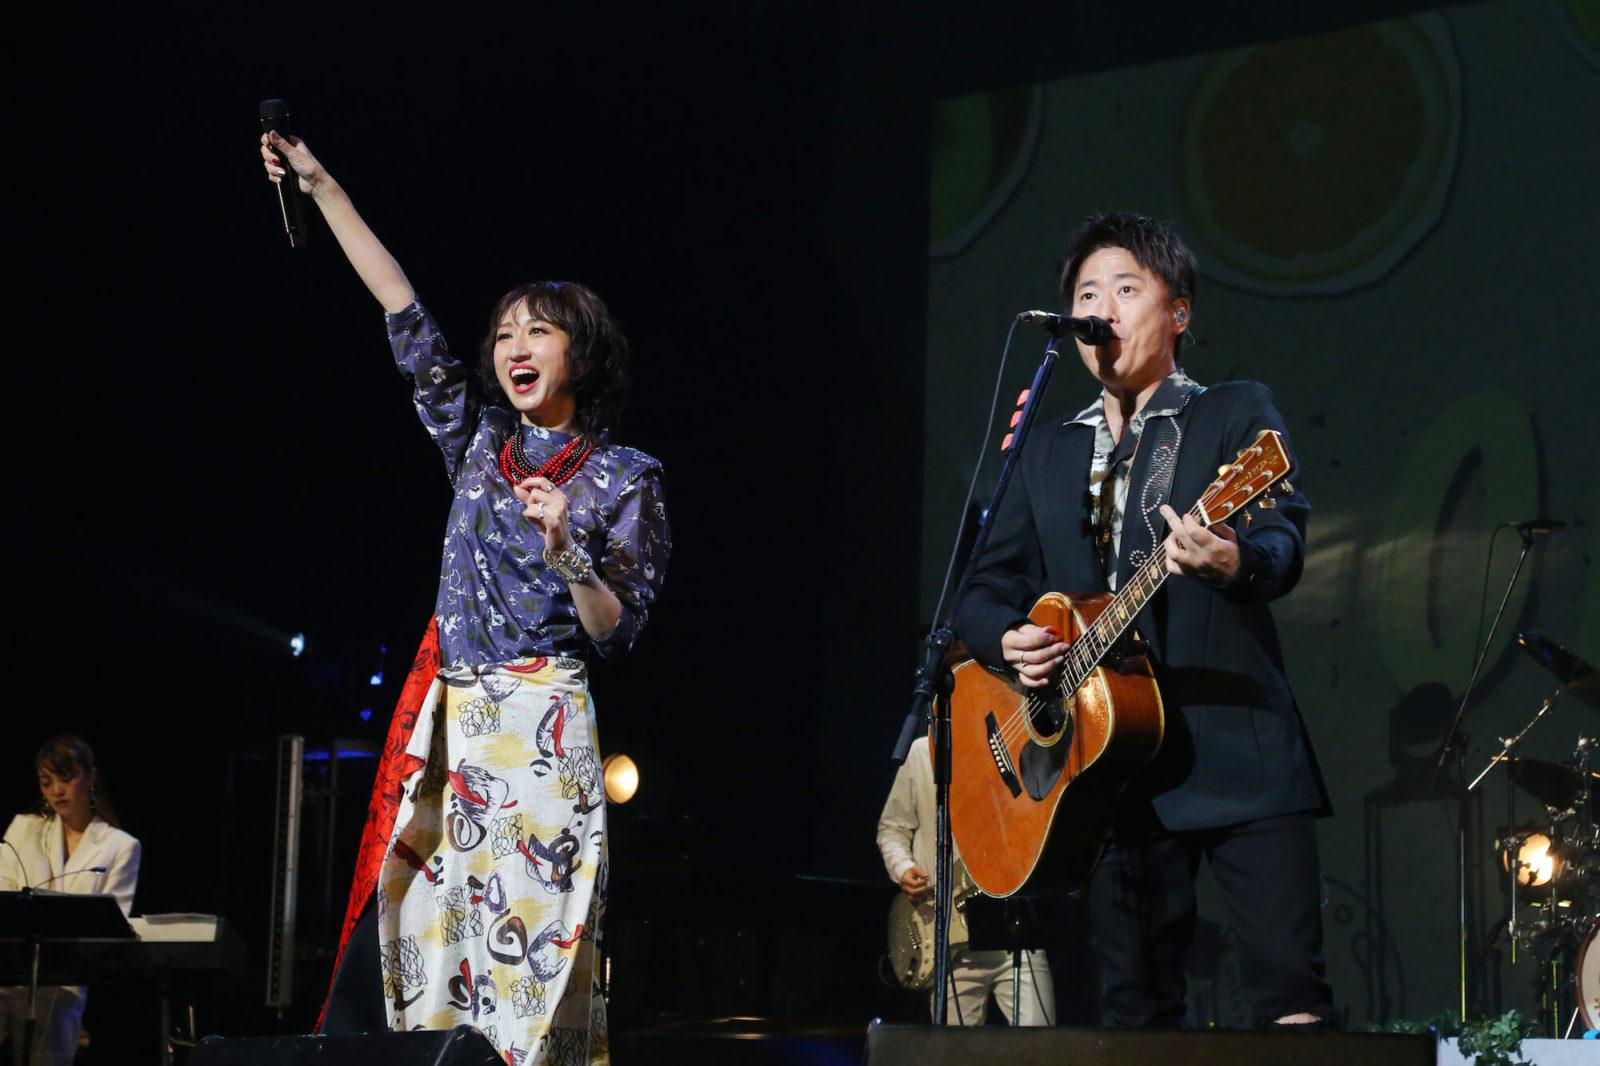 Ms.OOJA 全国ホールワンマンツアー東京公演に、スぺシャルゲストとして小渕健太郎(コブクロ)が登場サムネイル画像